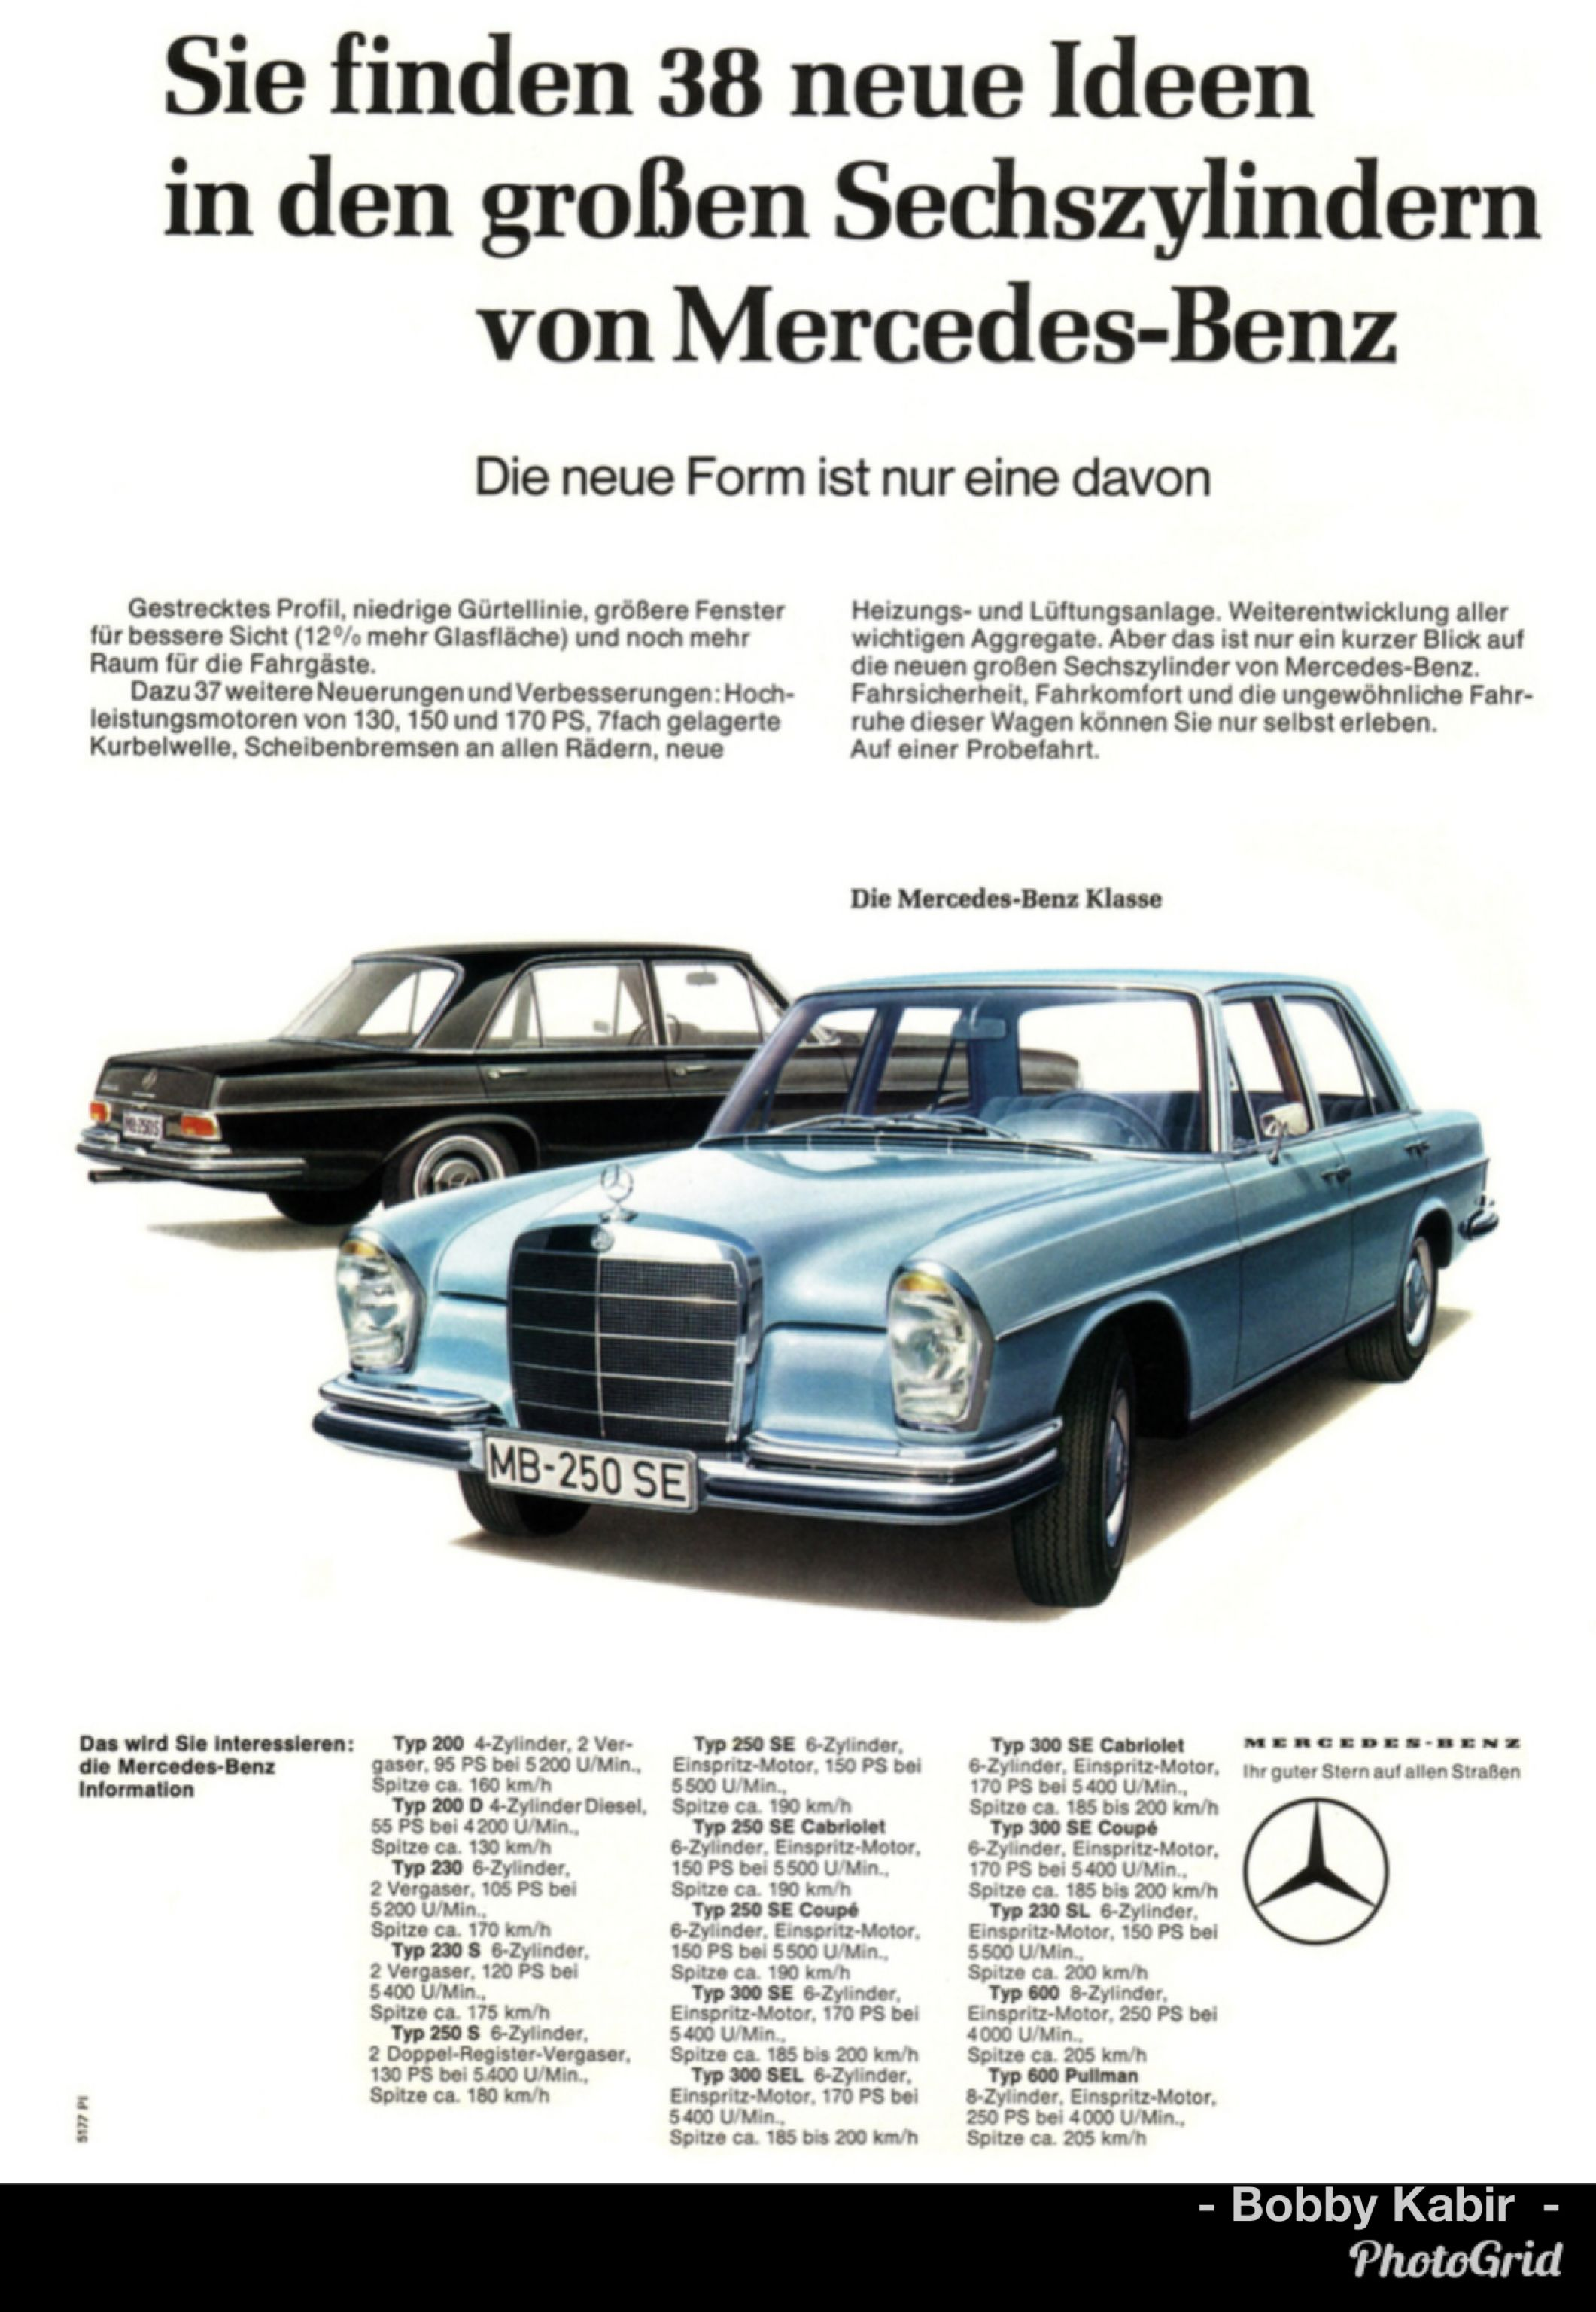 1965 Mercedes-Benz 250 SE (W108) in German by H2074 on Flickr | Car ...